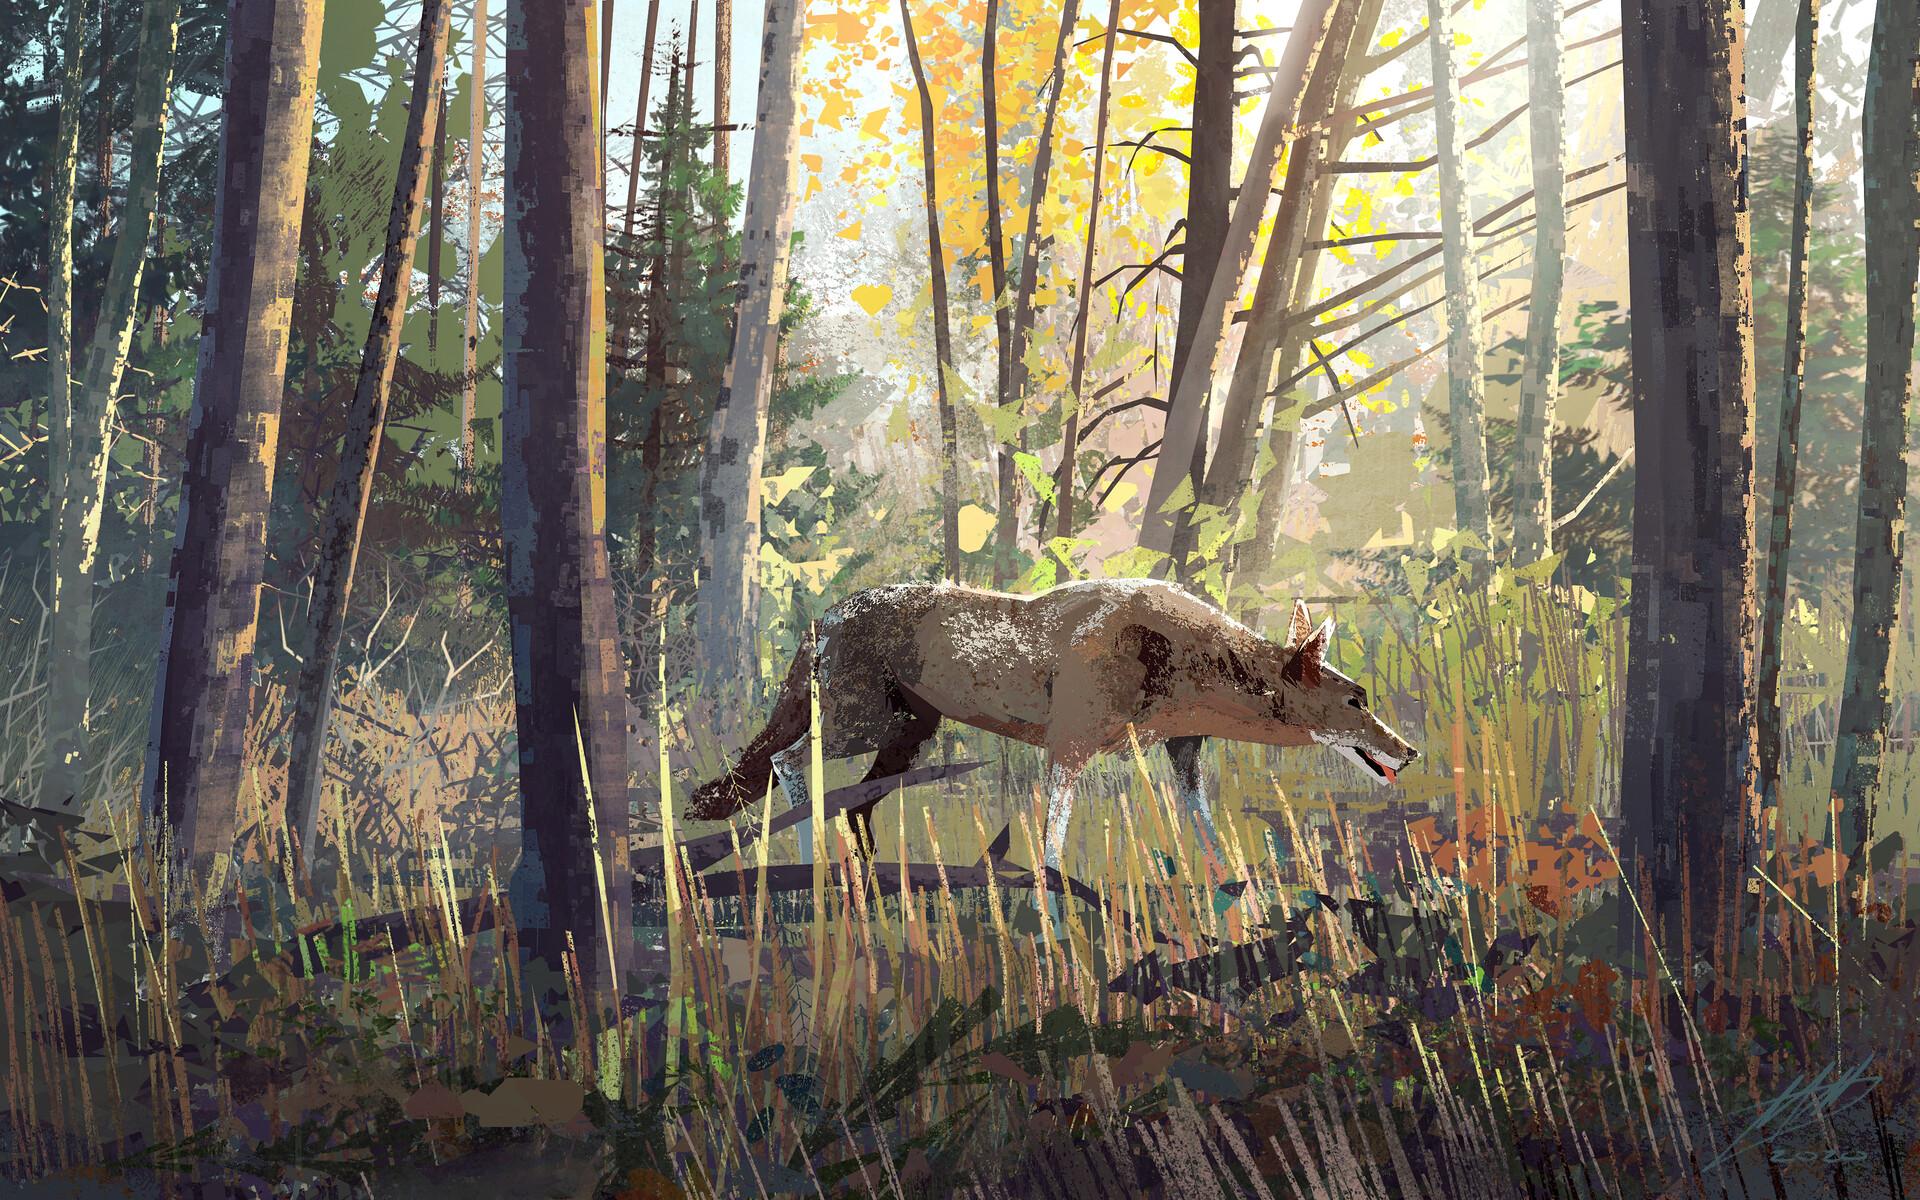 Mike mccain coyote